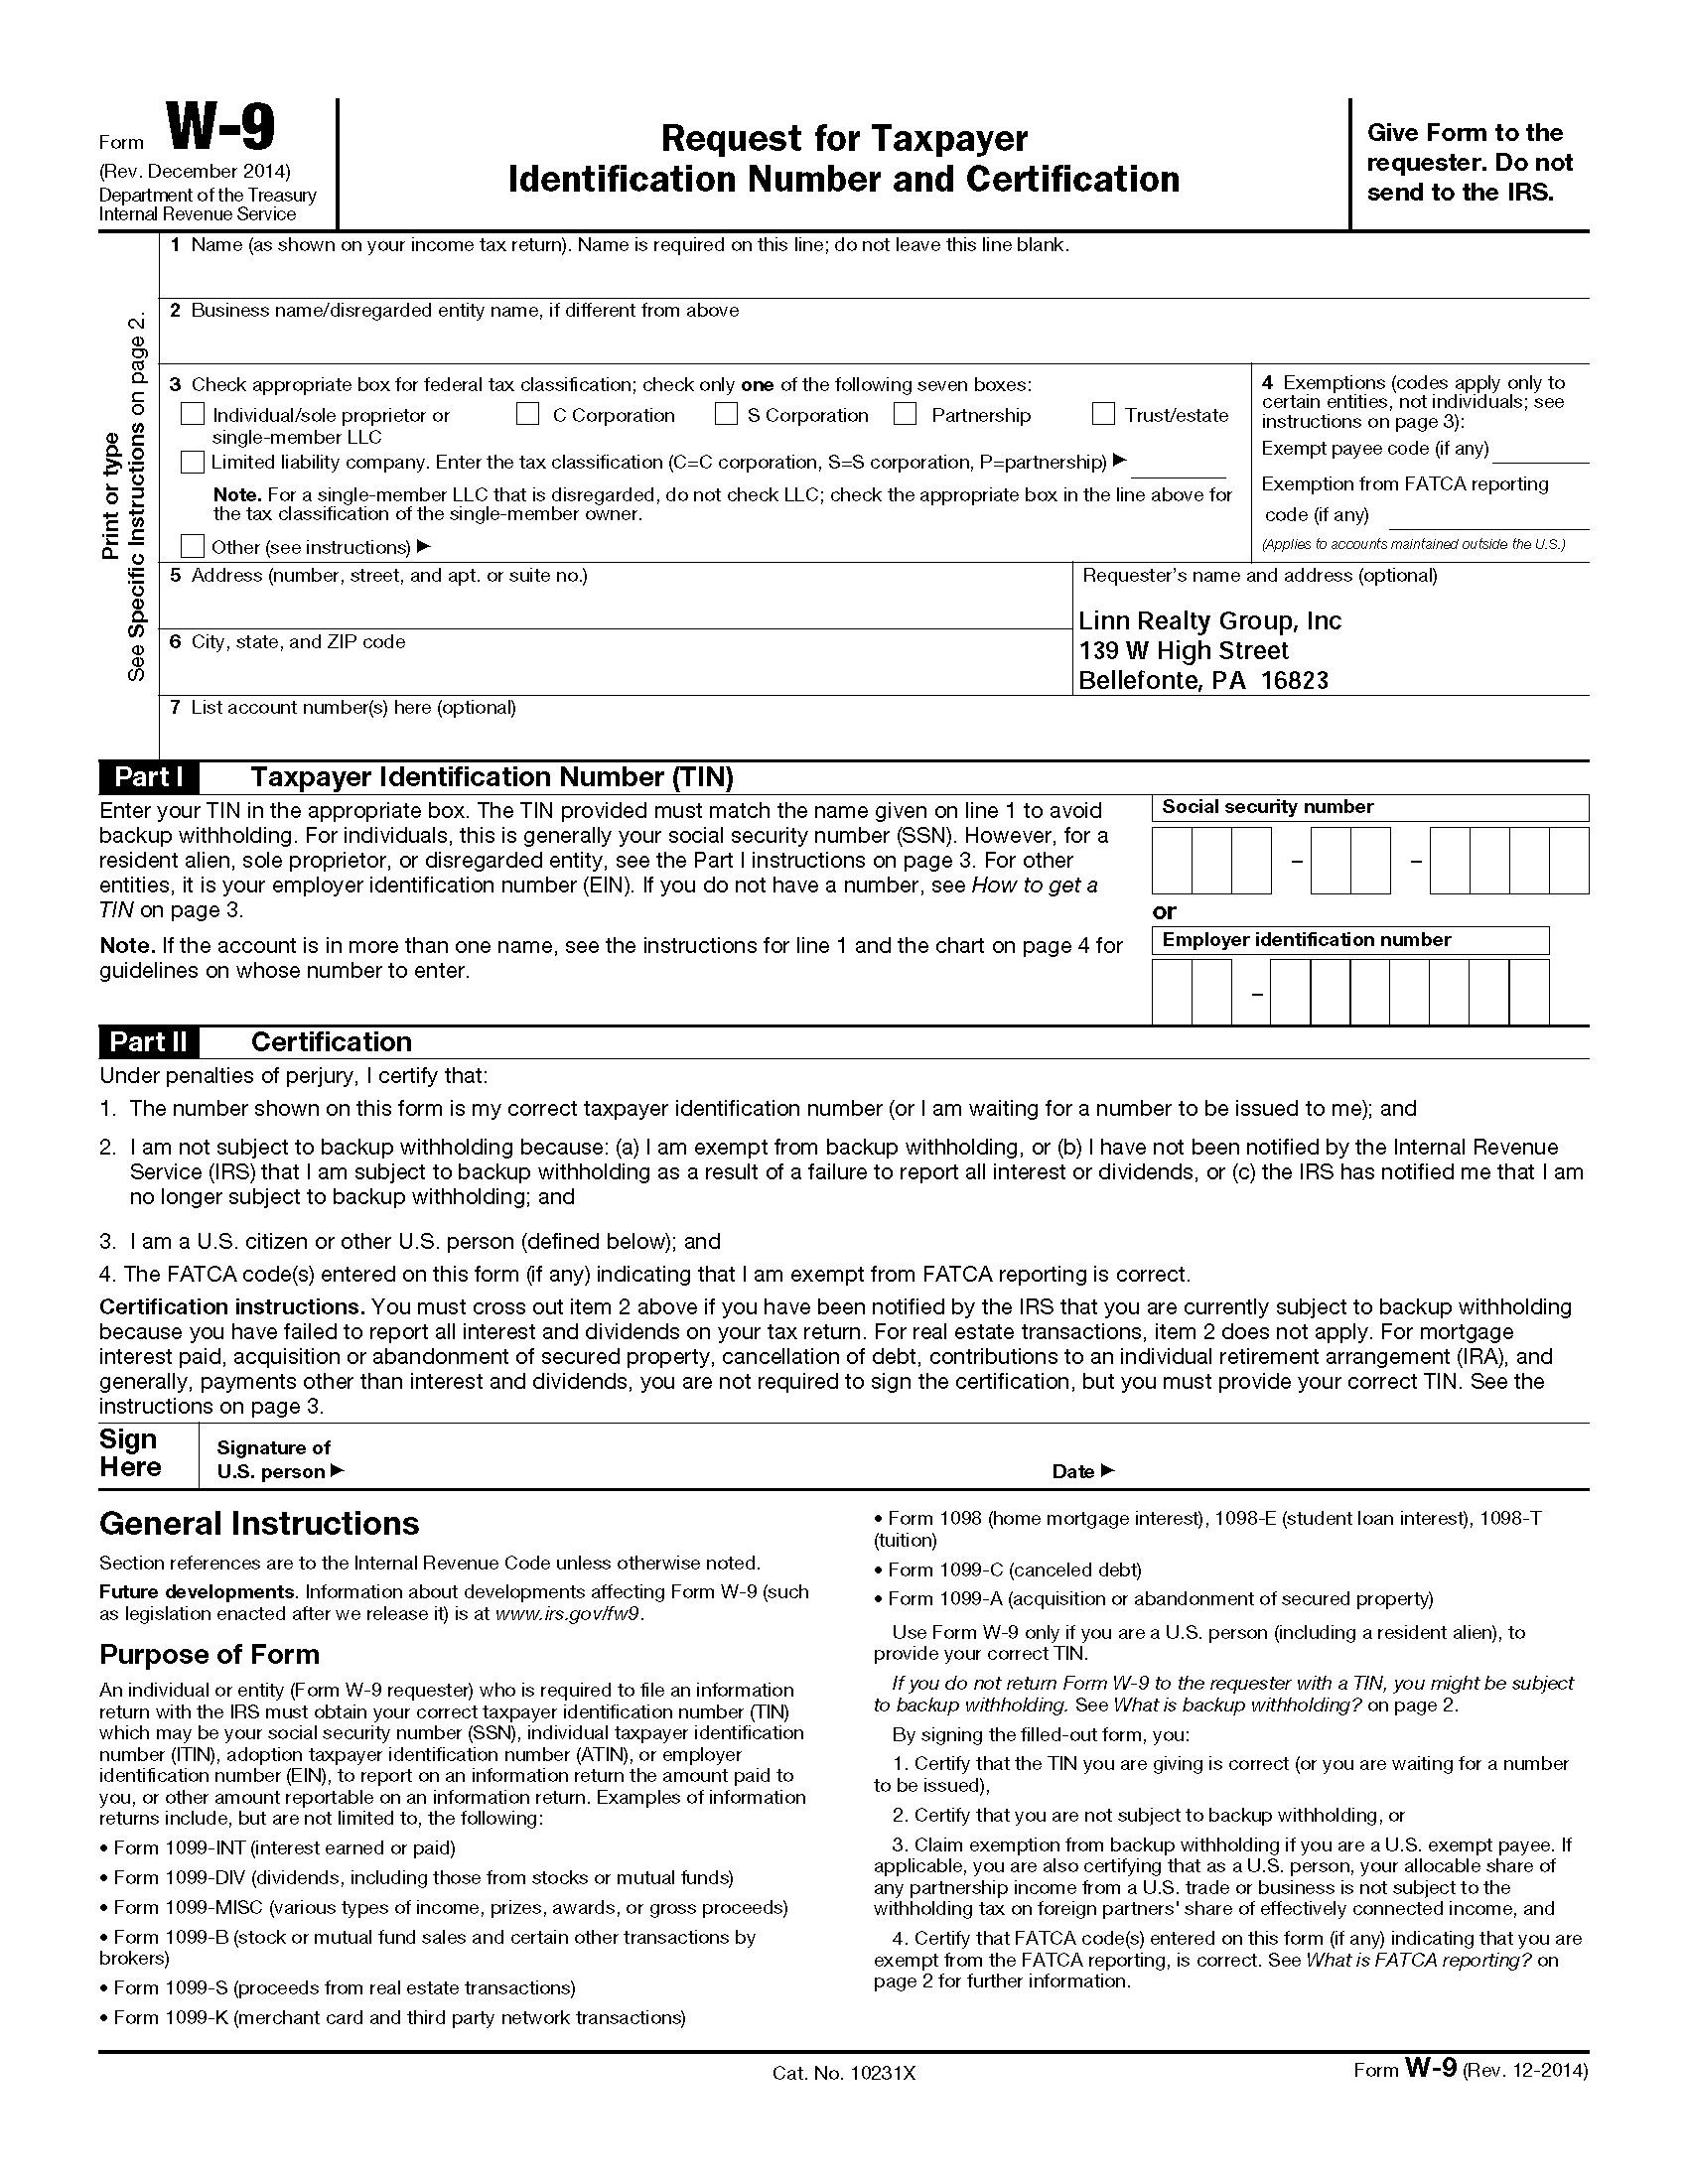 W9 Forms 2020 Printable Pdf Irs | Example Calendar Printable-W-9 Form 2021 Printable Pdf